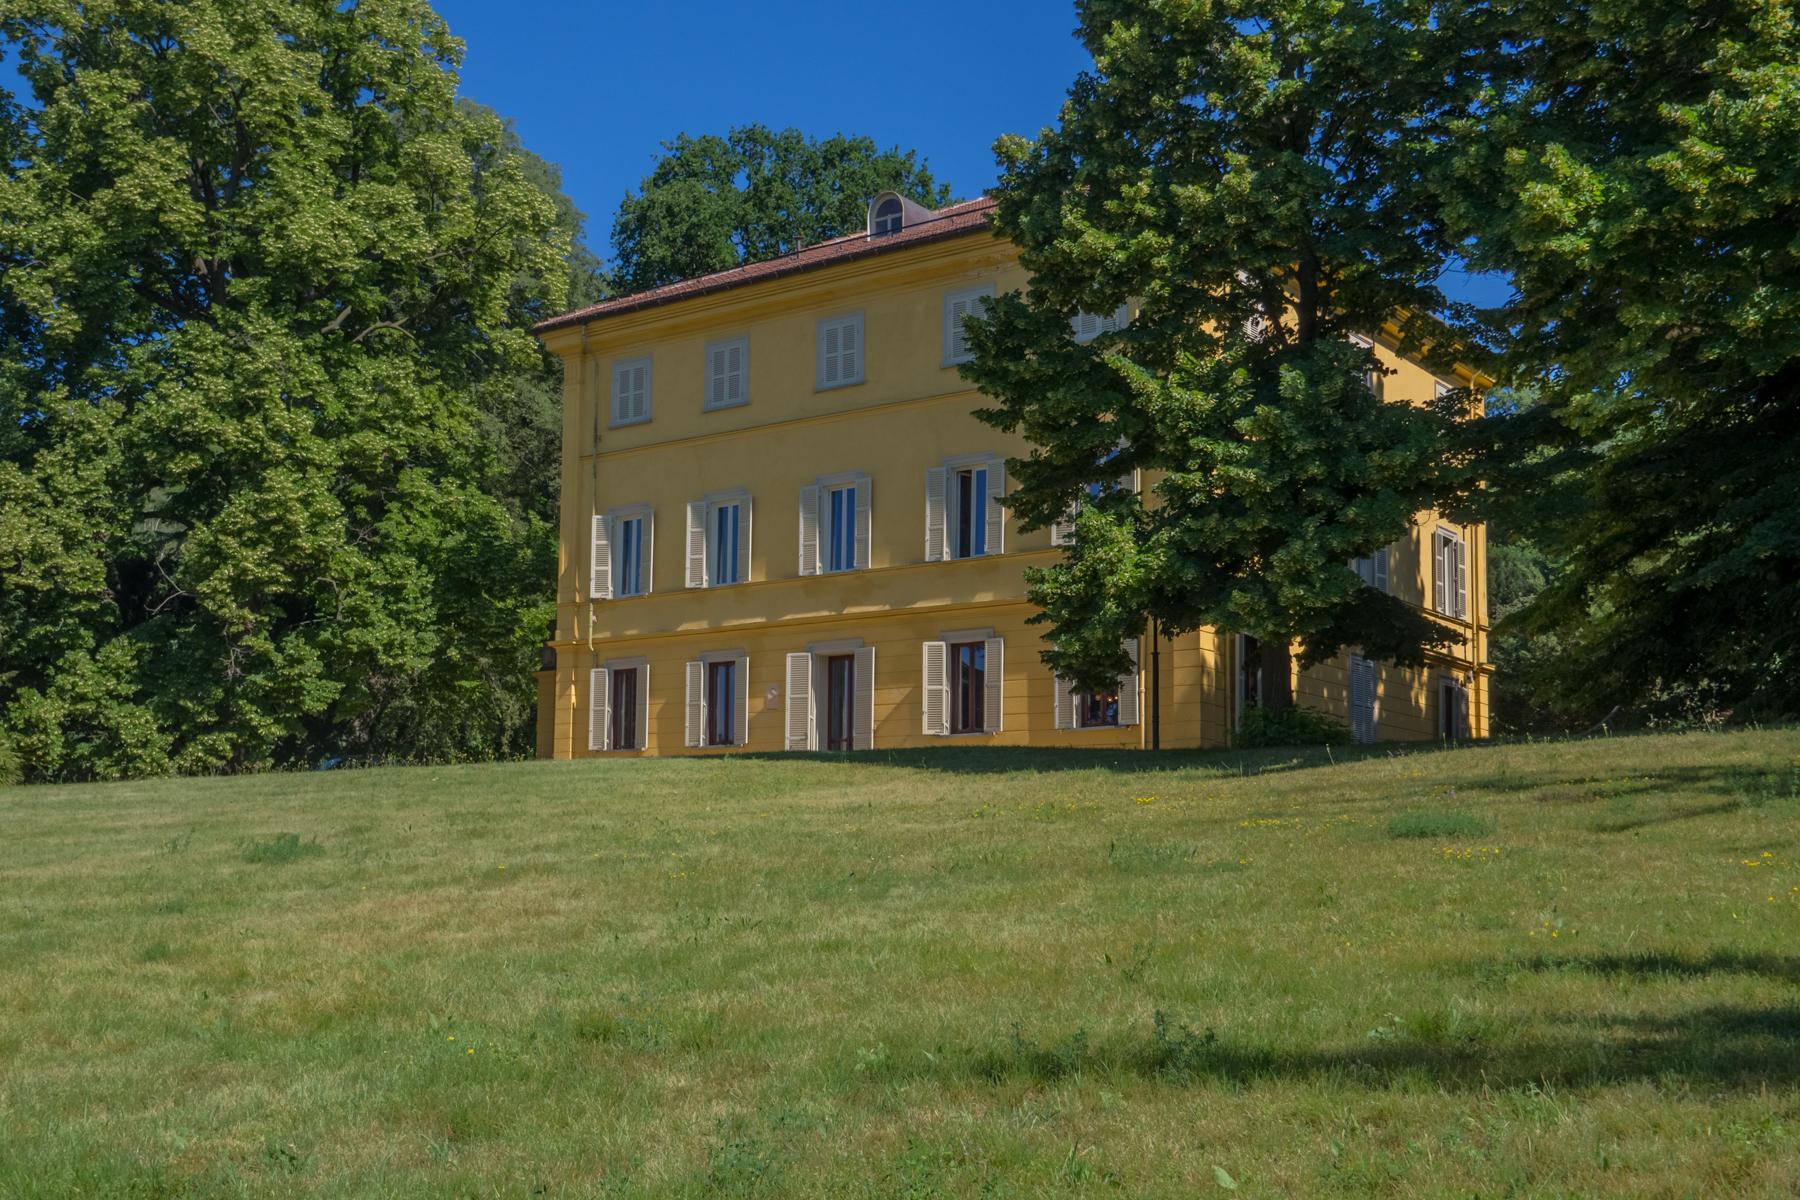 Villa in Affitto a Moncalieri strada castelvecchio